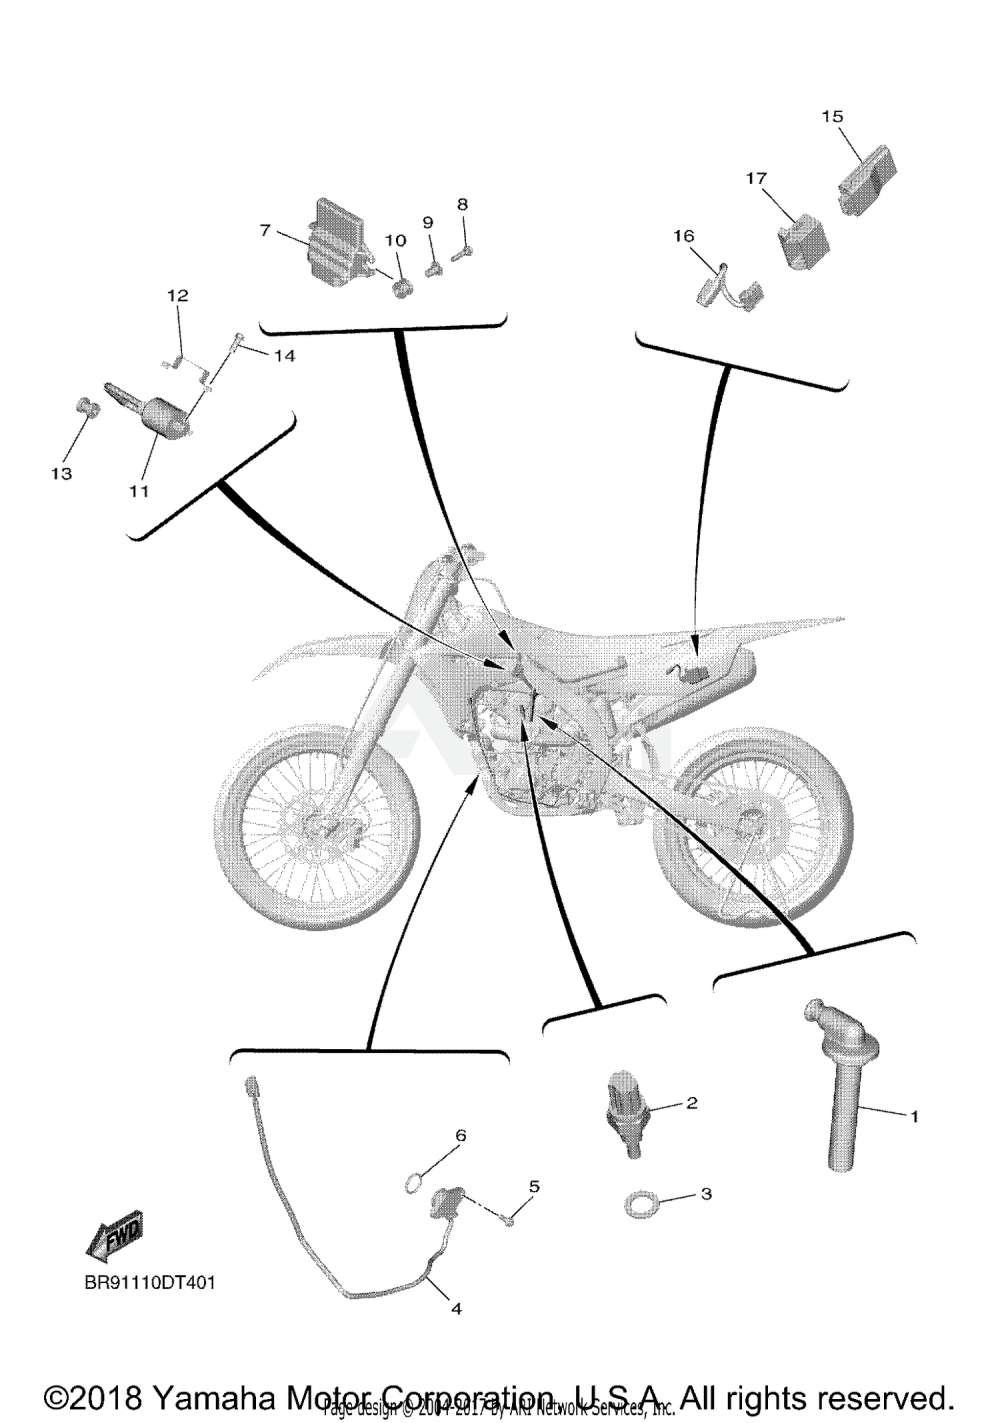 medium resolution of yamaha bike diagram wiring diagram centre yamaha dirt bike wiring diagram 2019 yamaha yz450fx electrical 1